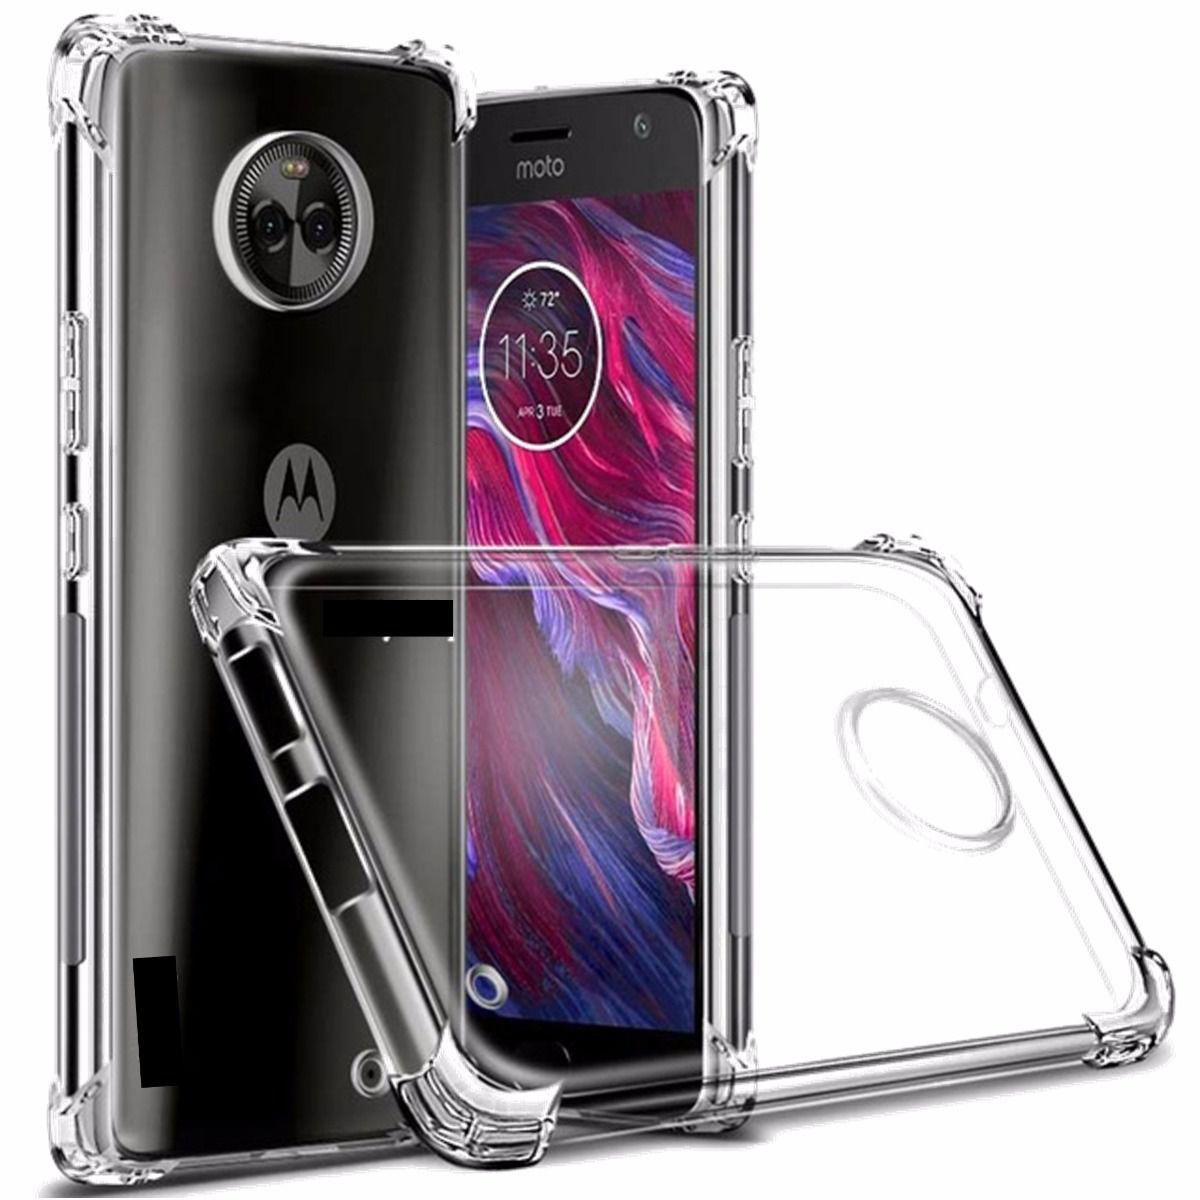 Capinha Anti-Shock Transparente Motorola G1 G2 G3 G4 G5 G6 PLUS ONE